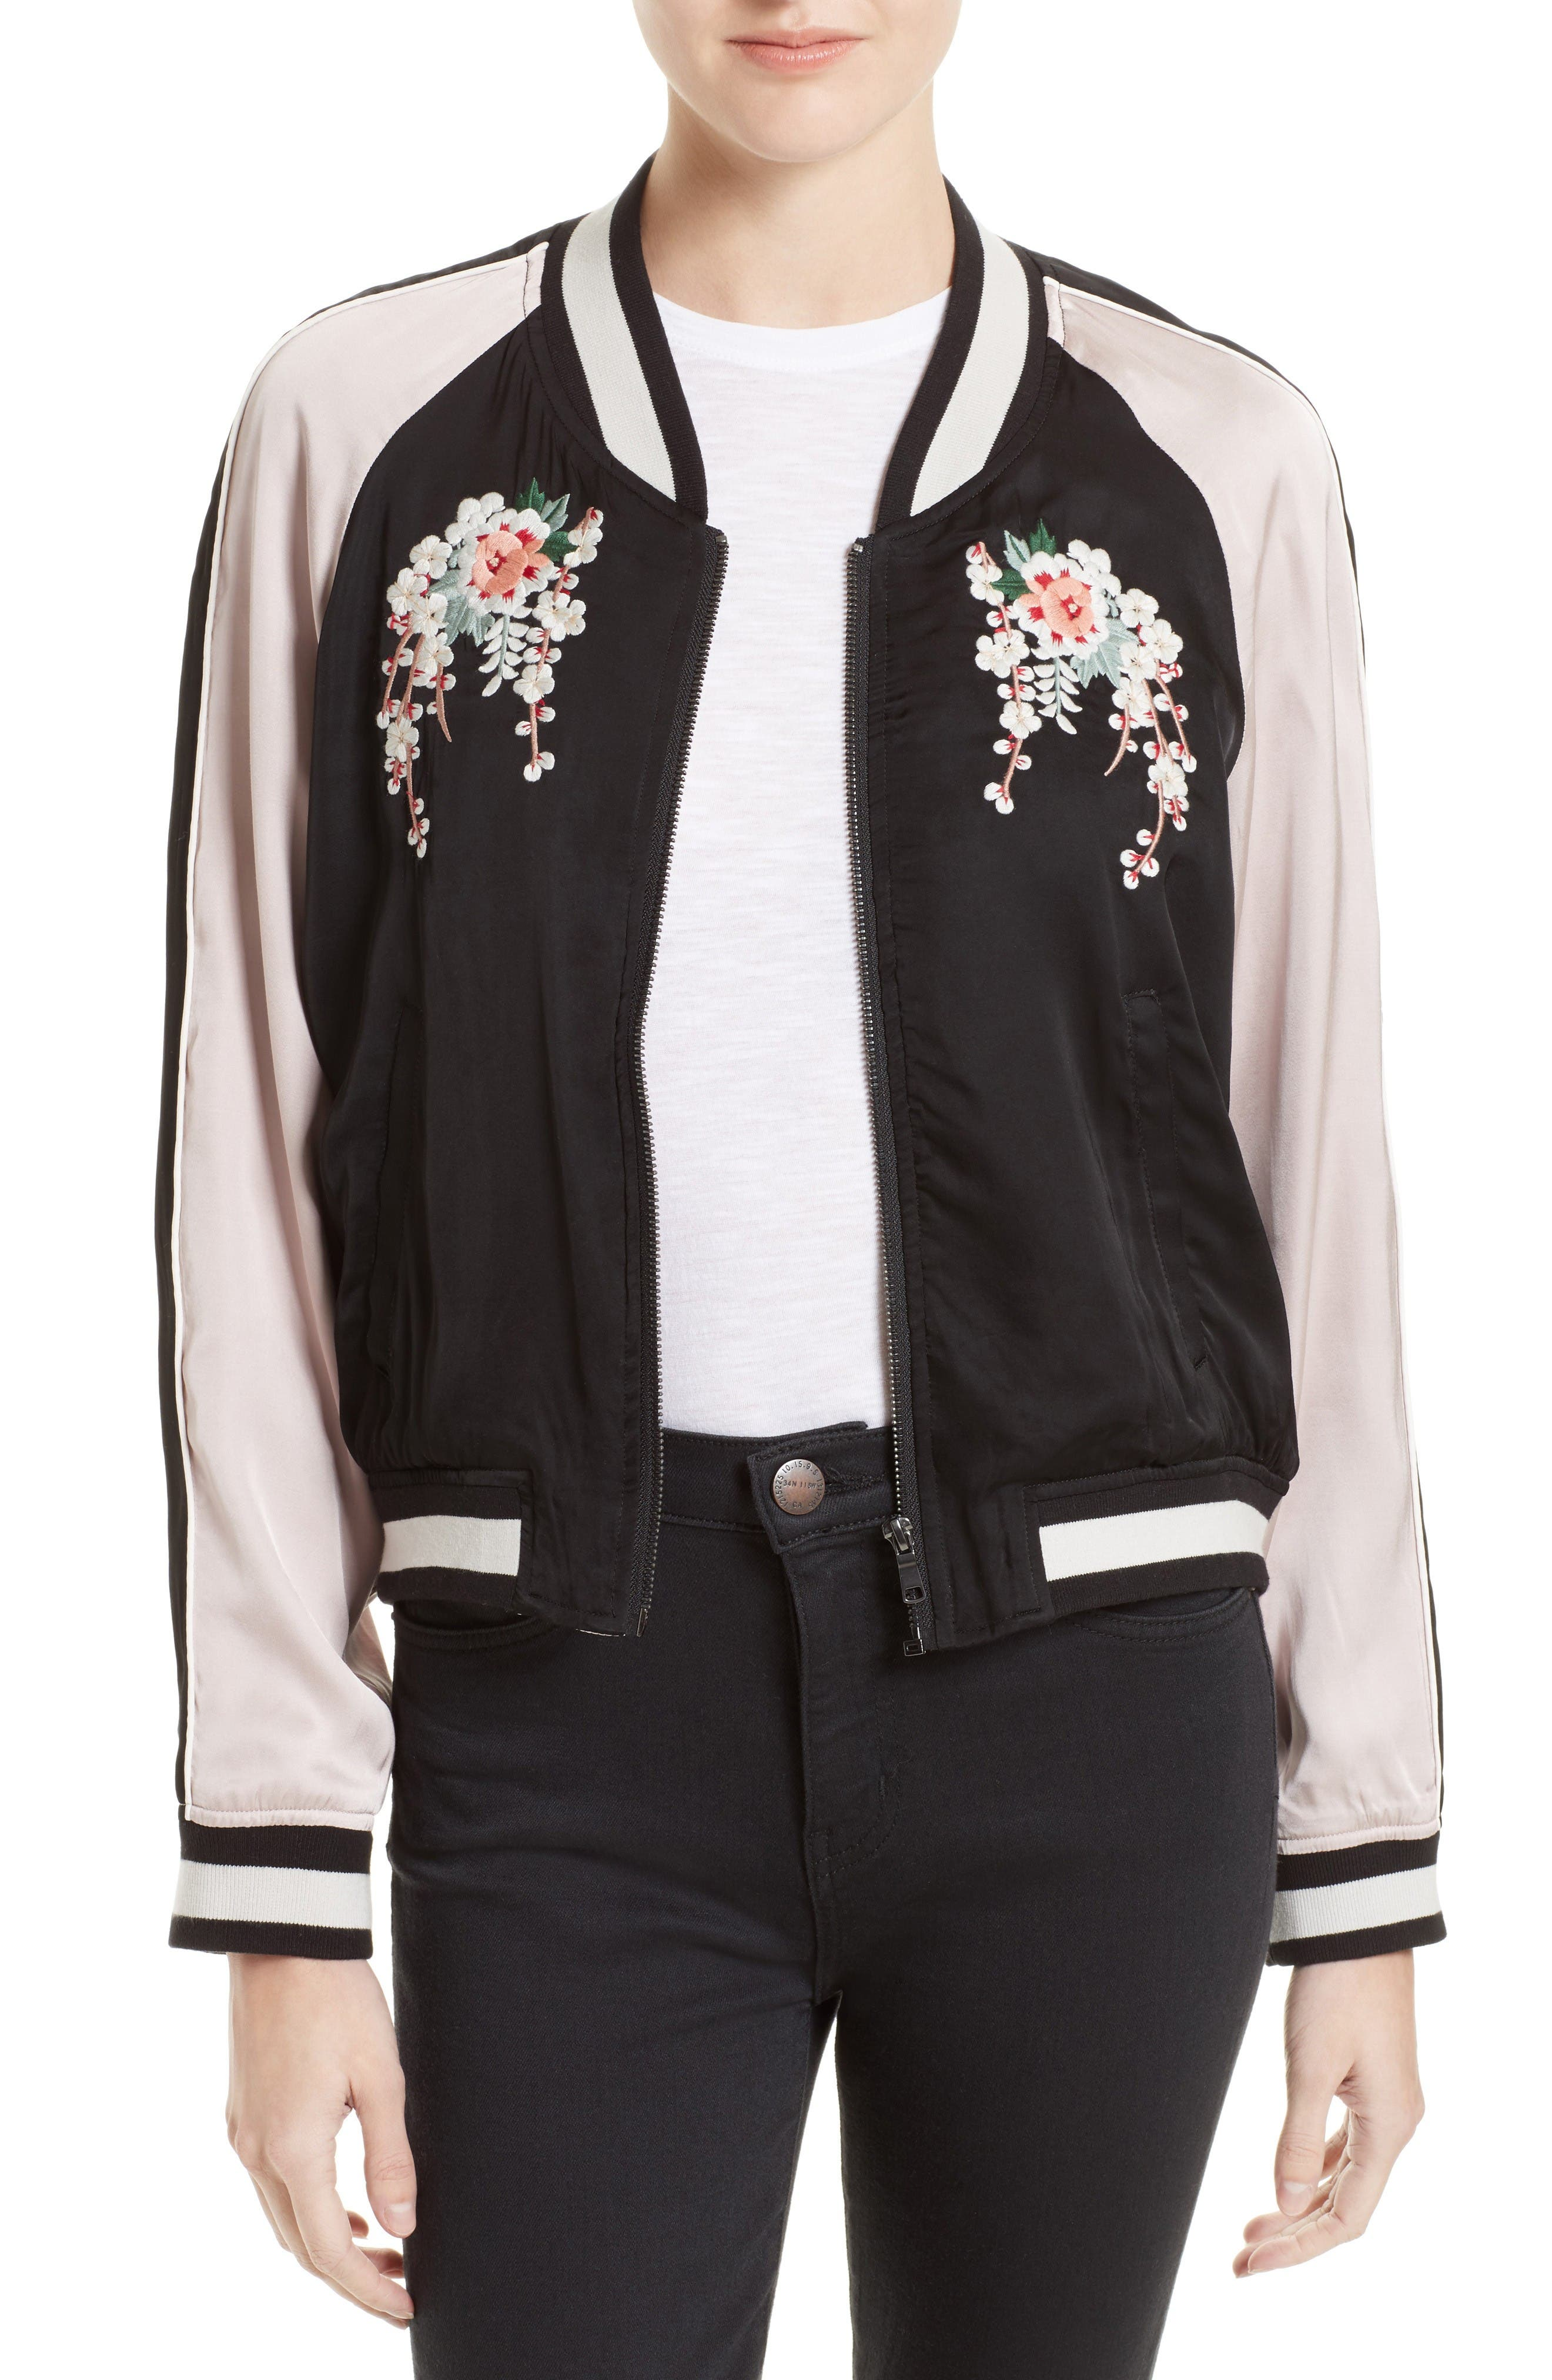 Alternate Image 1 Selected - Joie Juanita Embroidered Bomber Jacket